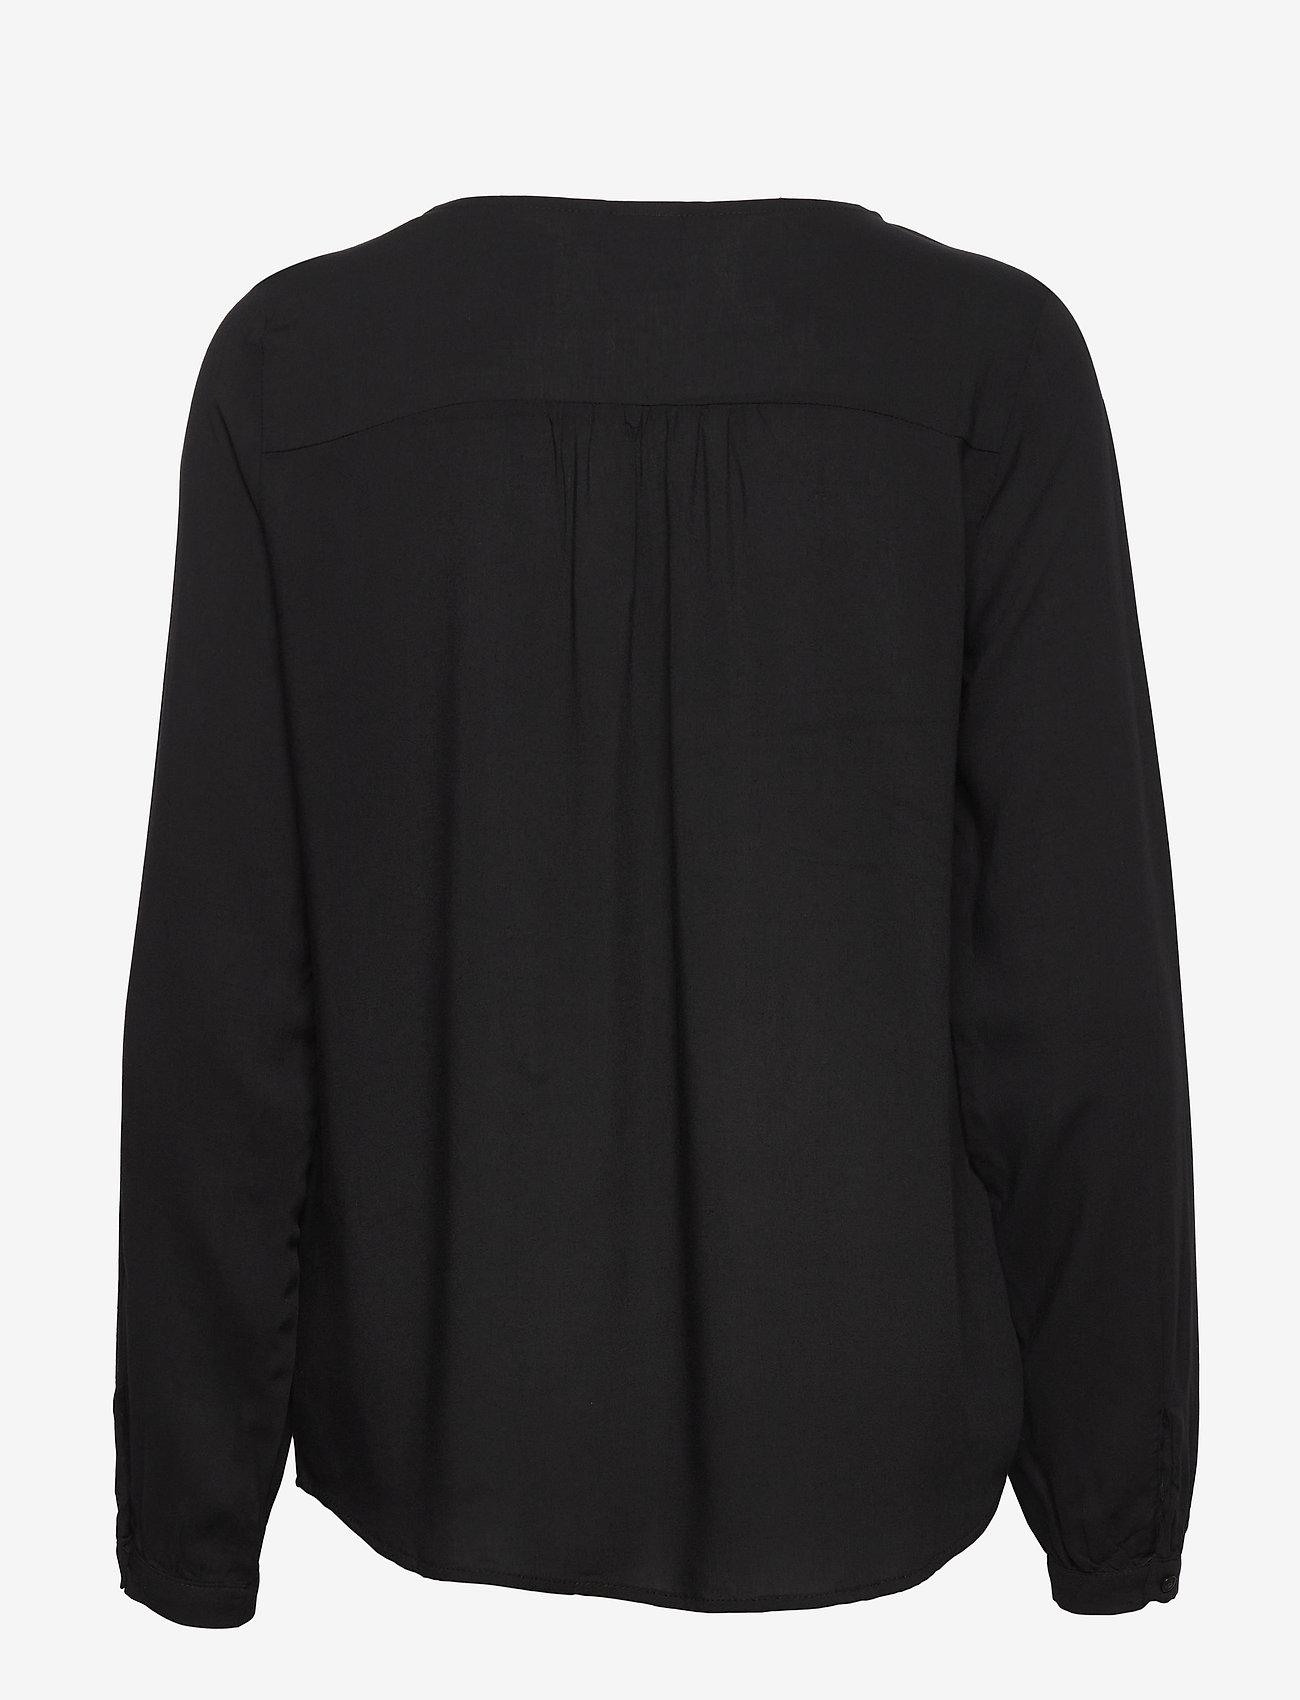 ICHI - IHMAJA LS - long sleeved blouses - black - 1